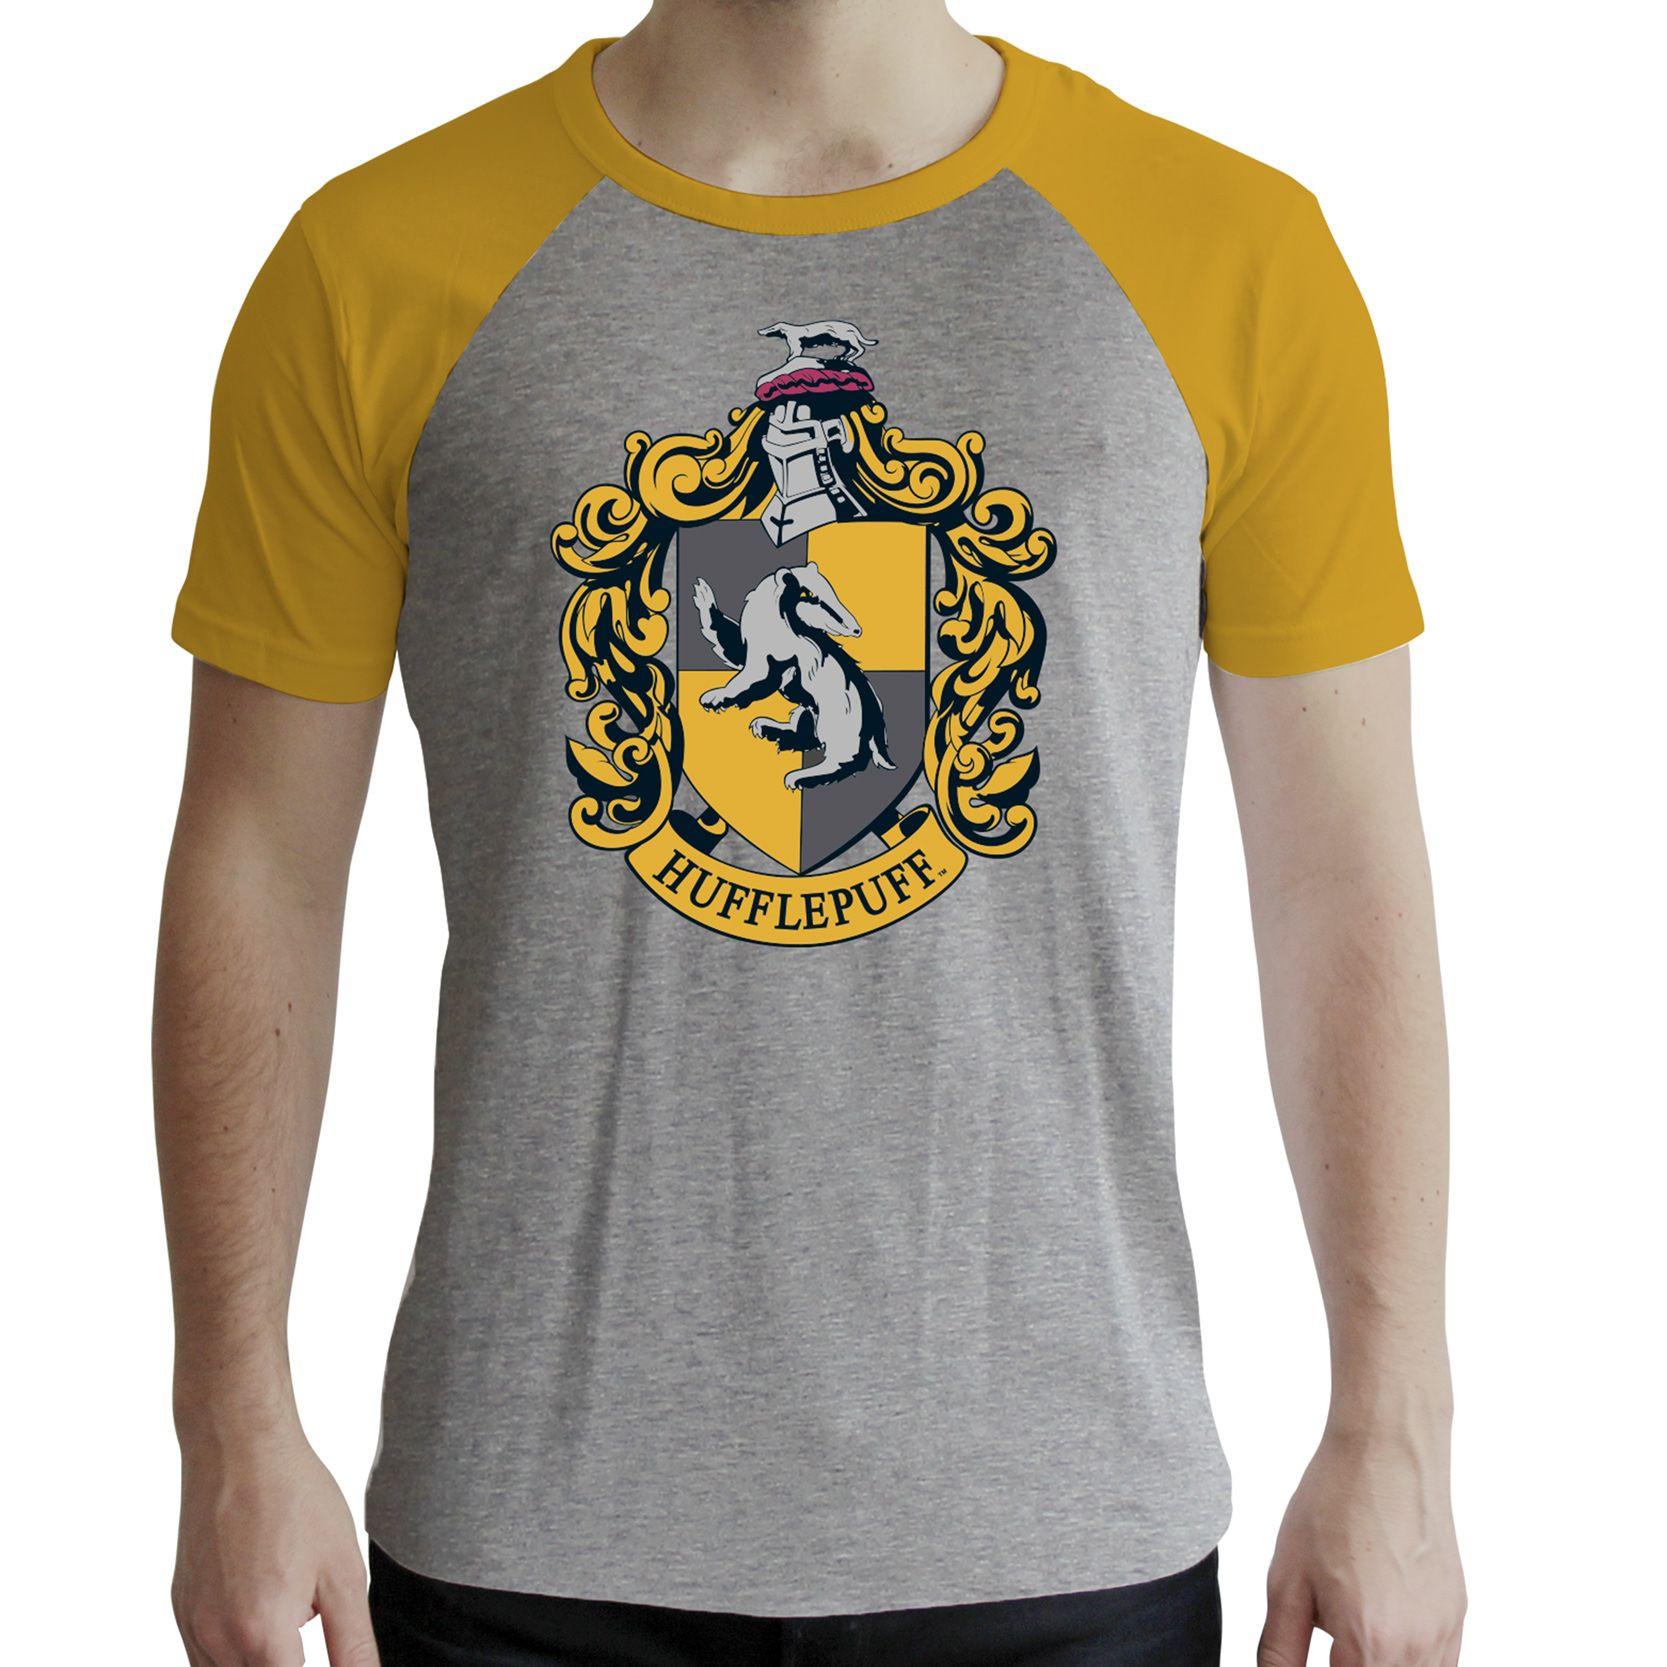 Harry Potter - Hufflepuff - T-Shirt